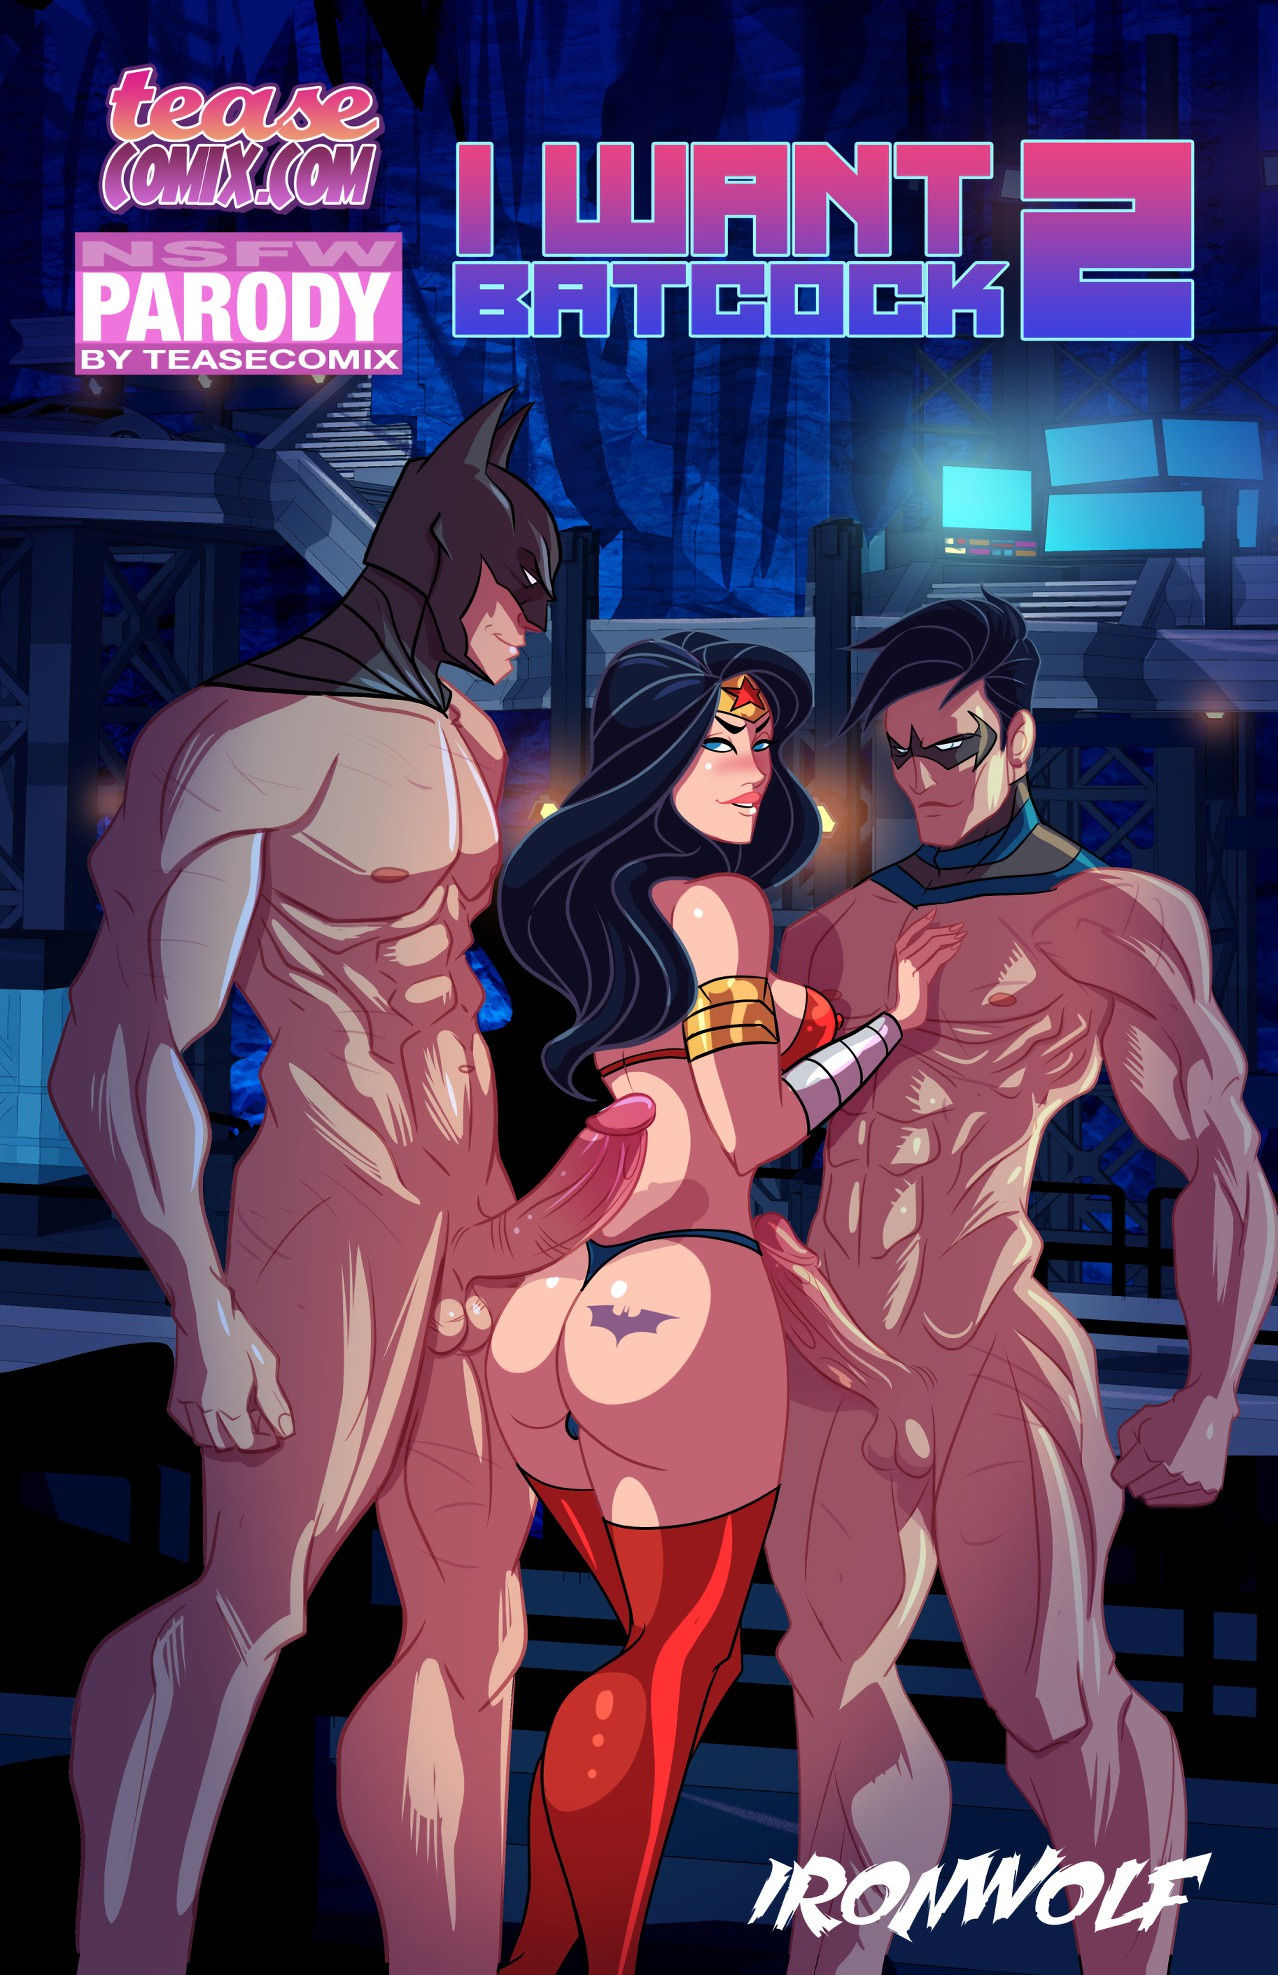 I want batcock 2 porn comic picture 1